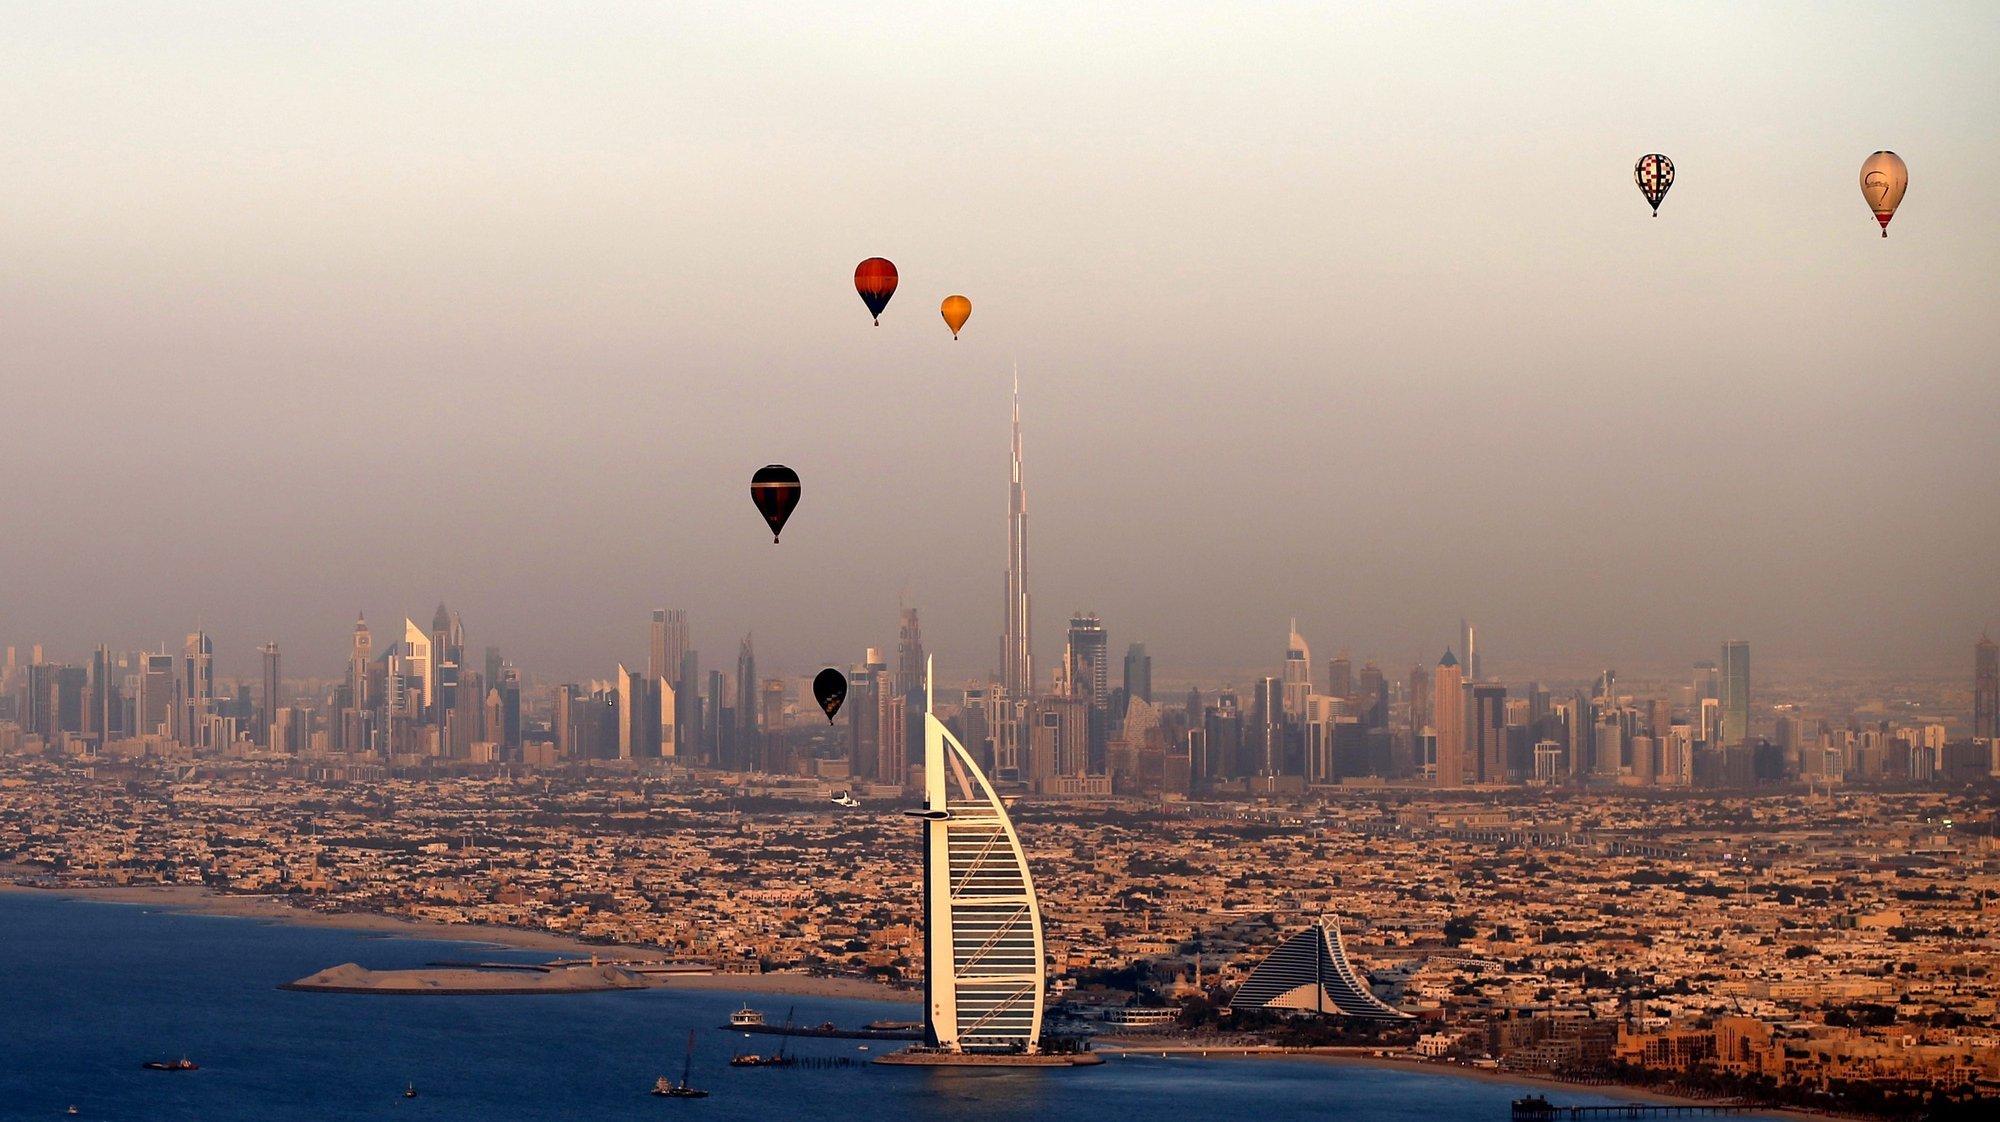 epaselect epa05066387 Hot Air Aerostats fly over the luxury hotel of Burj Al-Arab during Dubai International Balloon Fiesta as part of the last day of Dubai Air Games 2015 in Gulf emirate of Dubai, United Arab Emirates, 12 December 2015.  EPA/ALI HAIDER